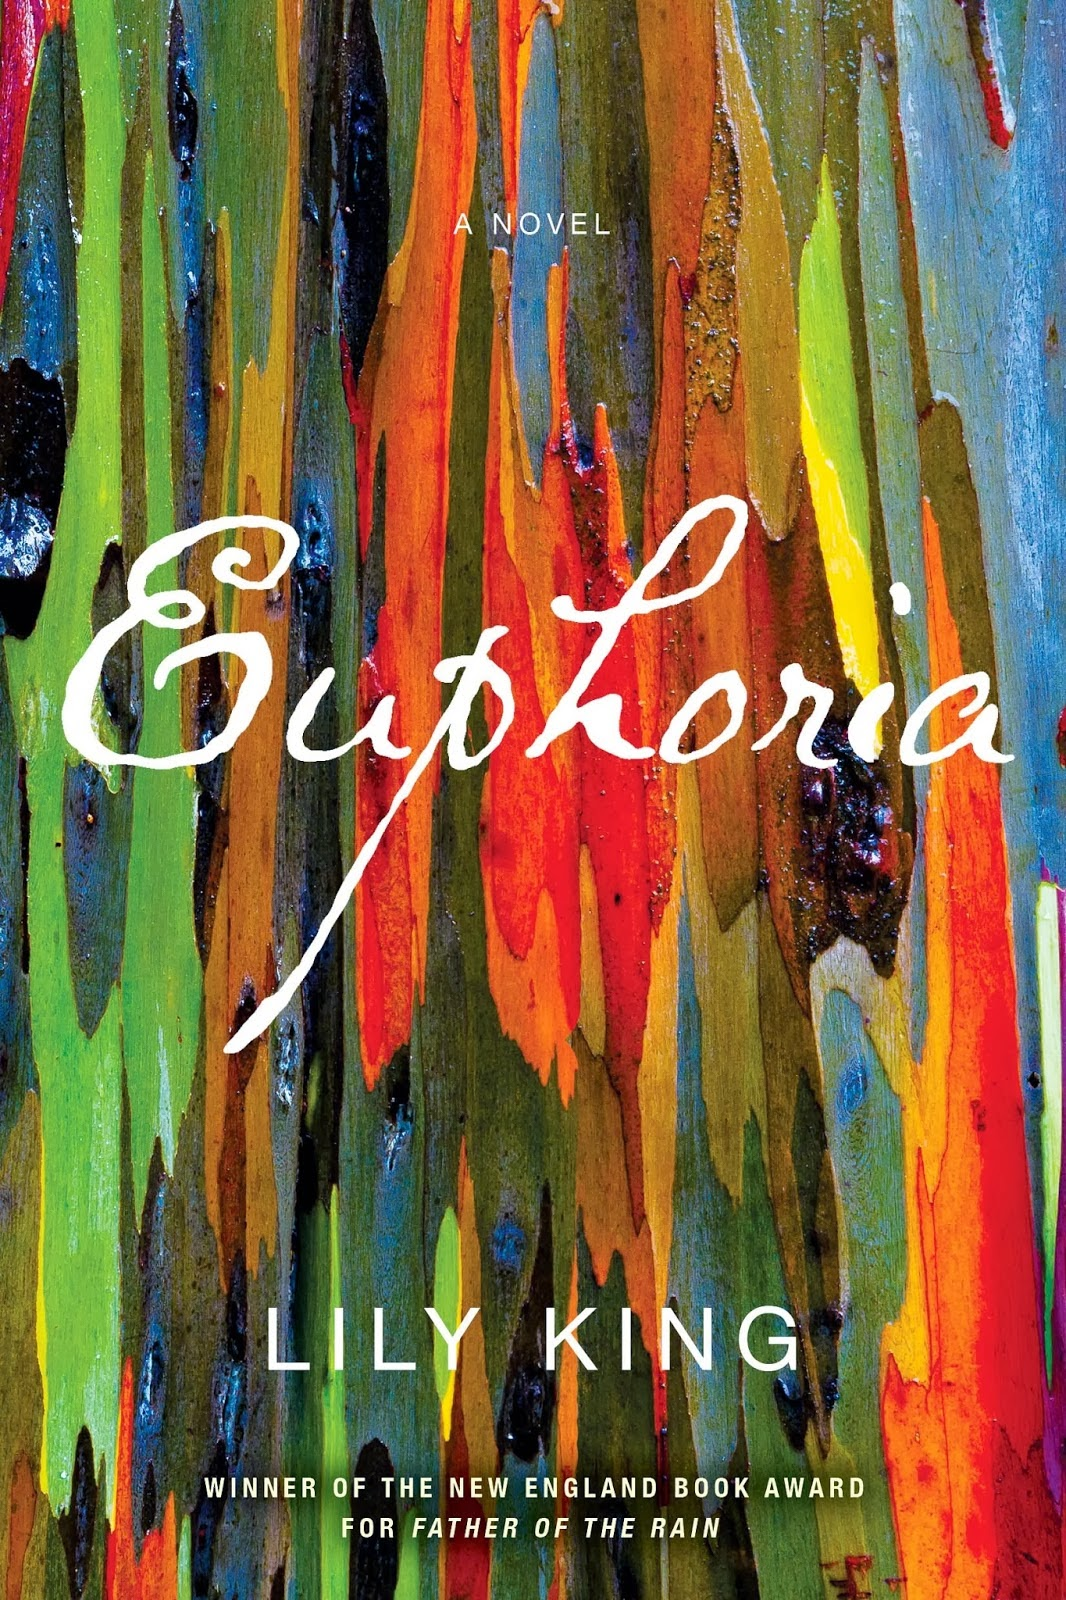 http://discover.halifaxpubliclibraries.ca/?q=title:euphoria%20author:king